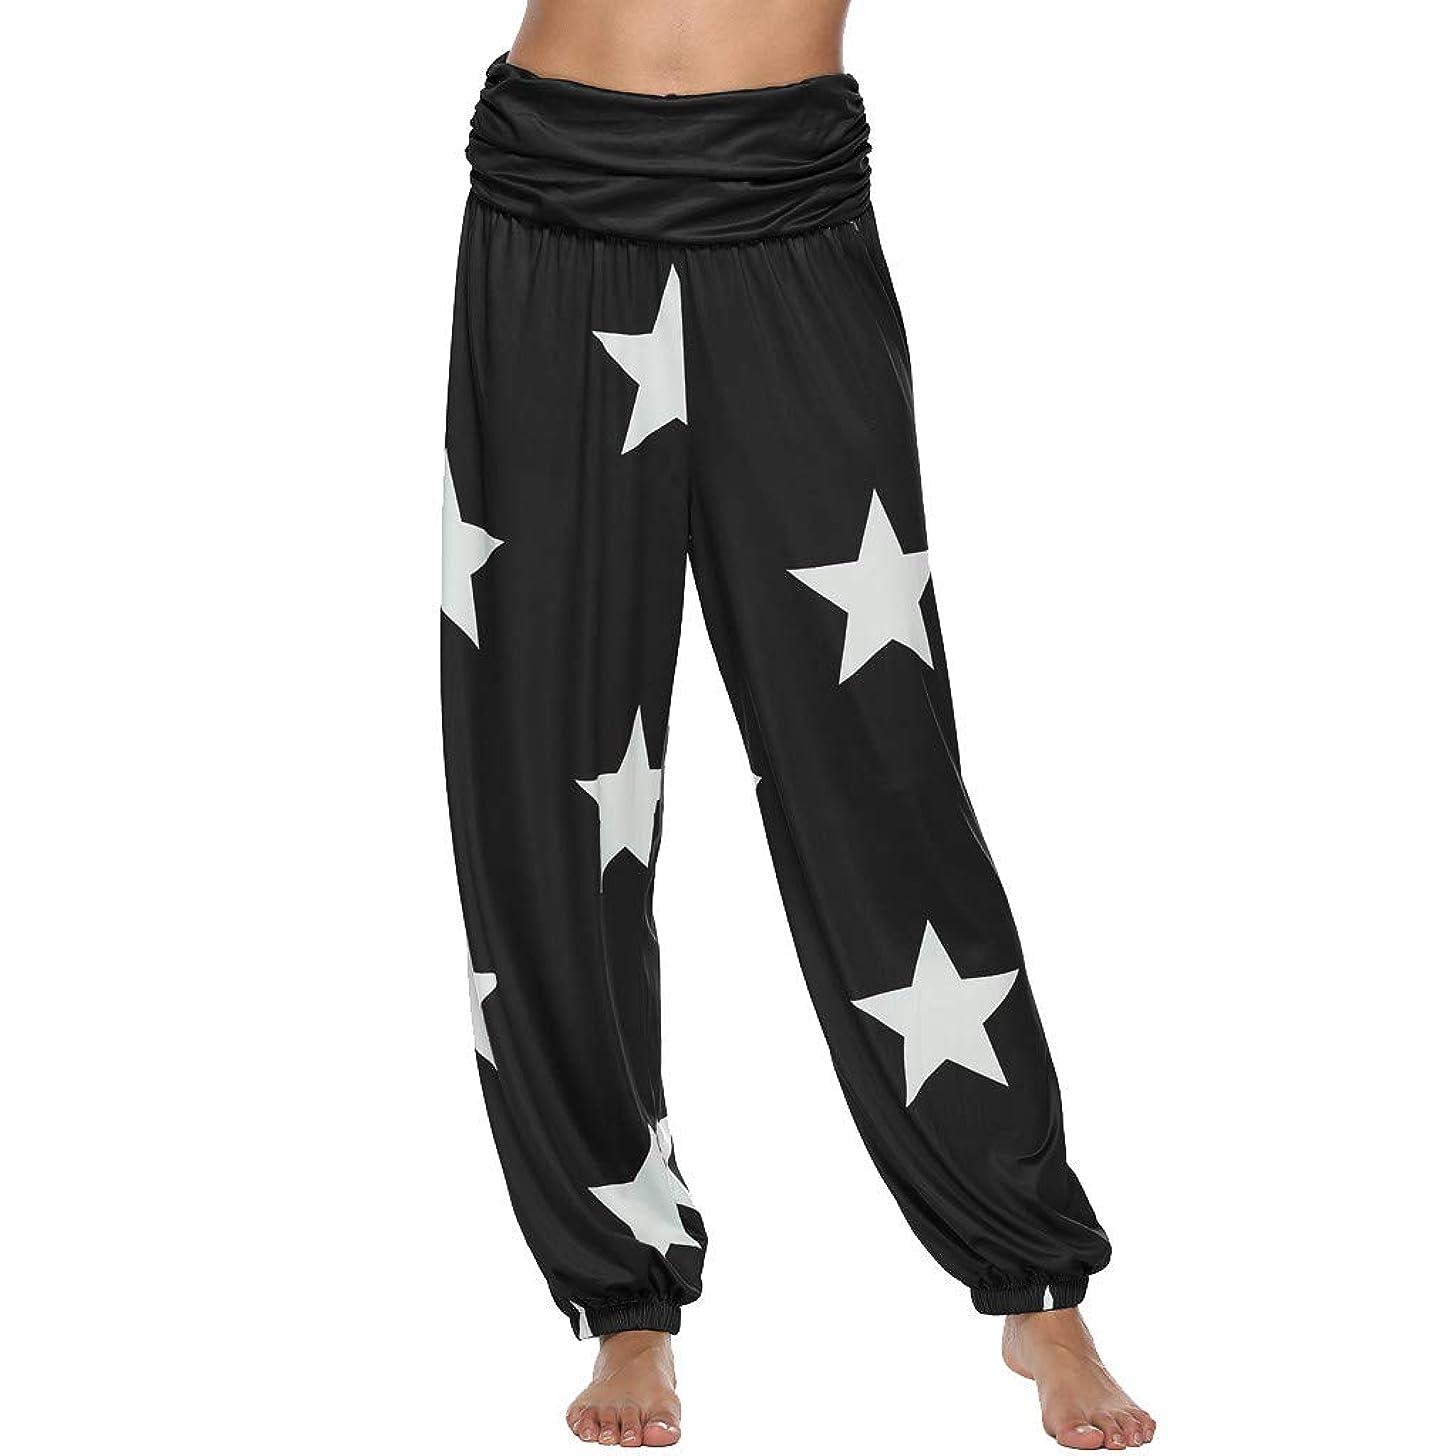 F_topbu Yoga Pants,Women Sport Workout Mid Waist Running Pants Fitness Elastic Yoga Leggings Trousers